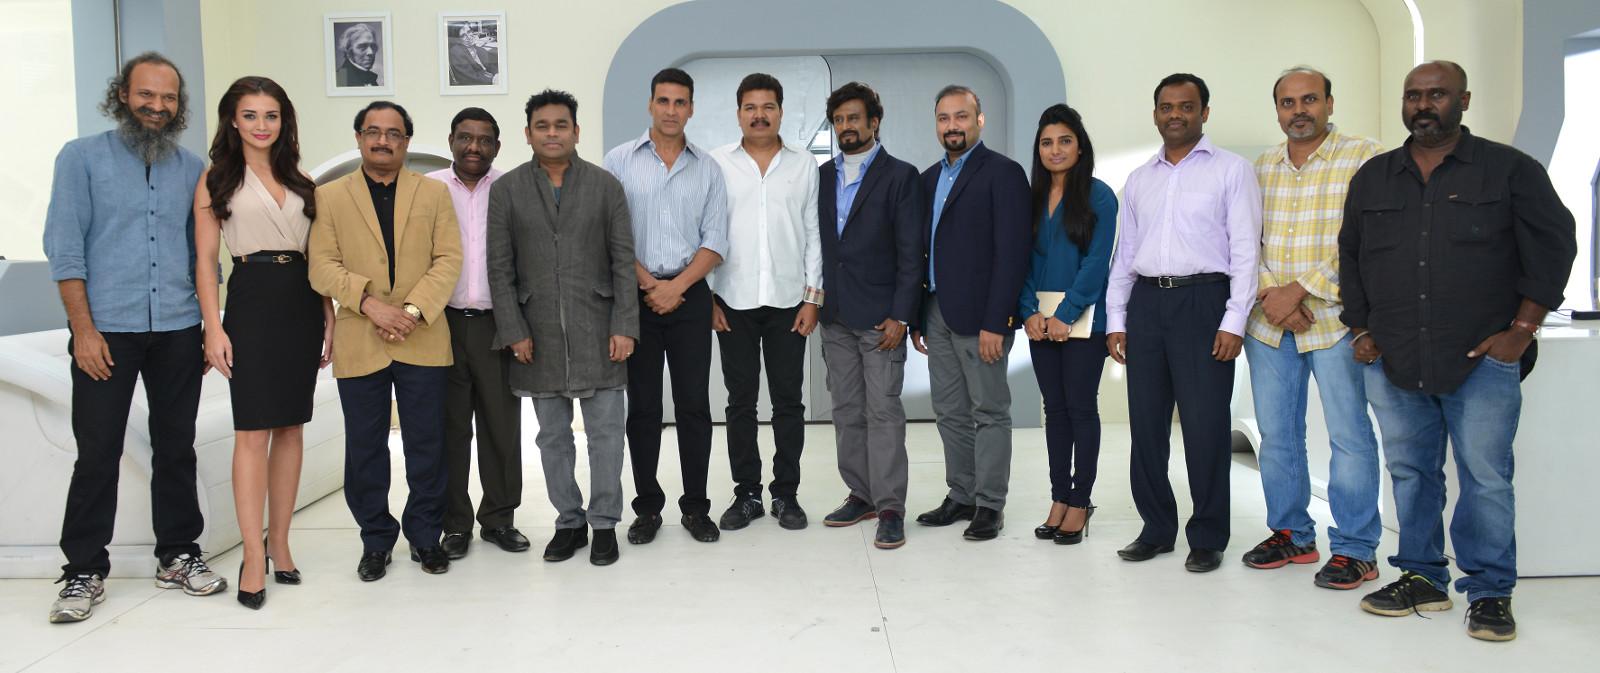 Director Shankar's 2.0 Movie Team Photo